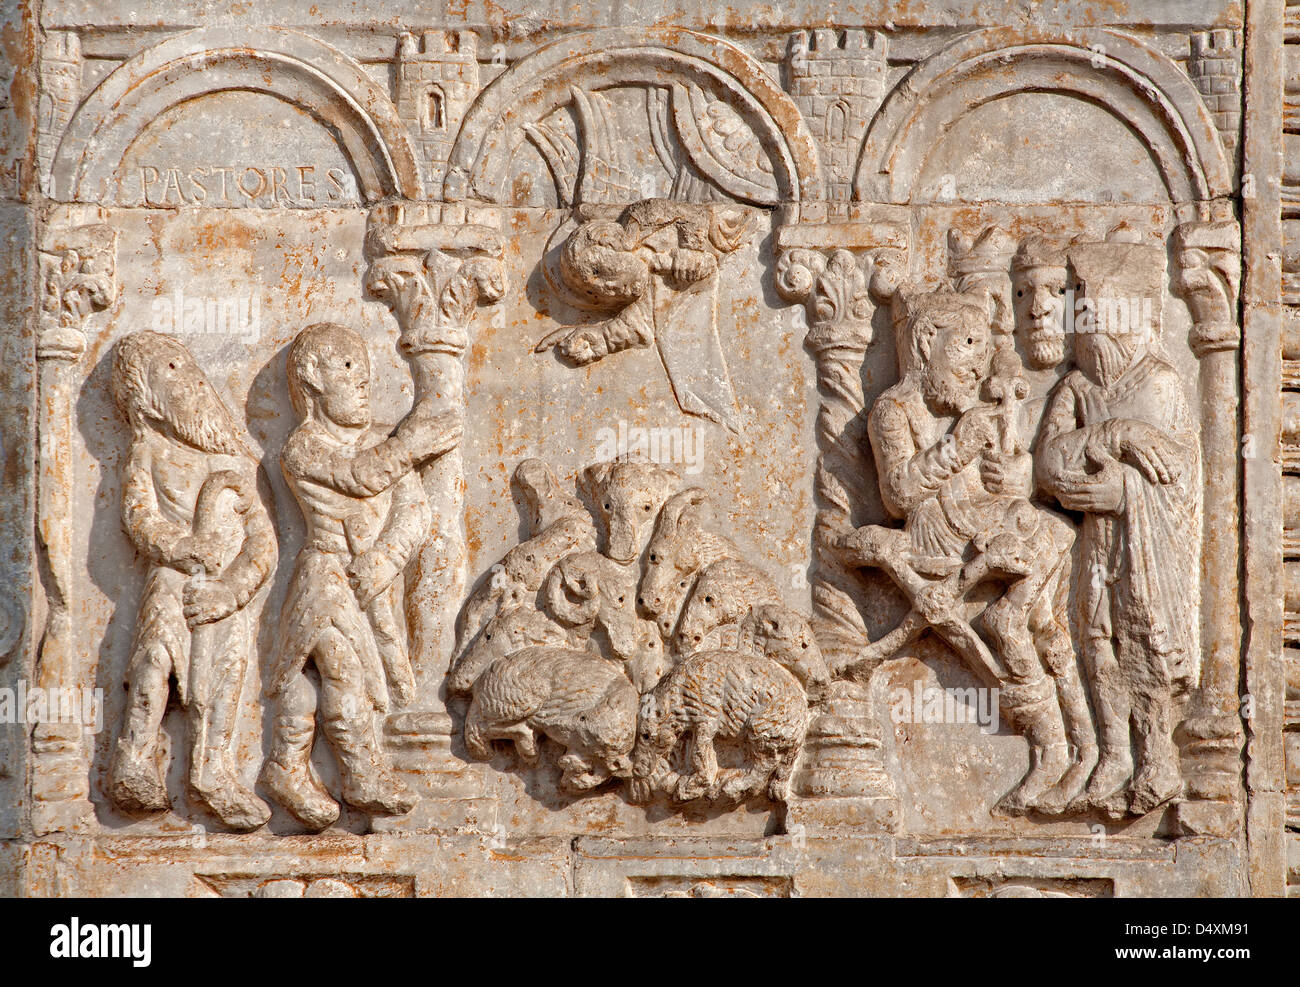 VERONA - JANUARY 27: Relief of Adoration of Magi and pastors from facade of Basilica San Zeno. - Stock Image